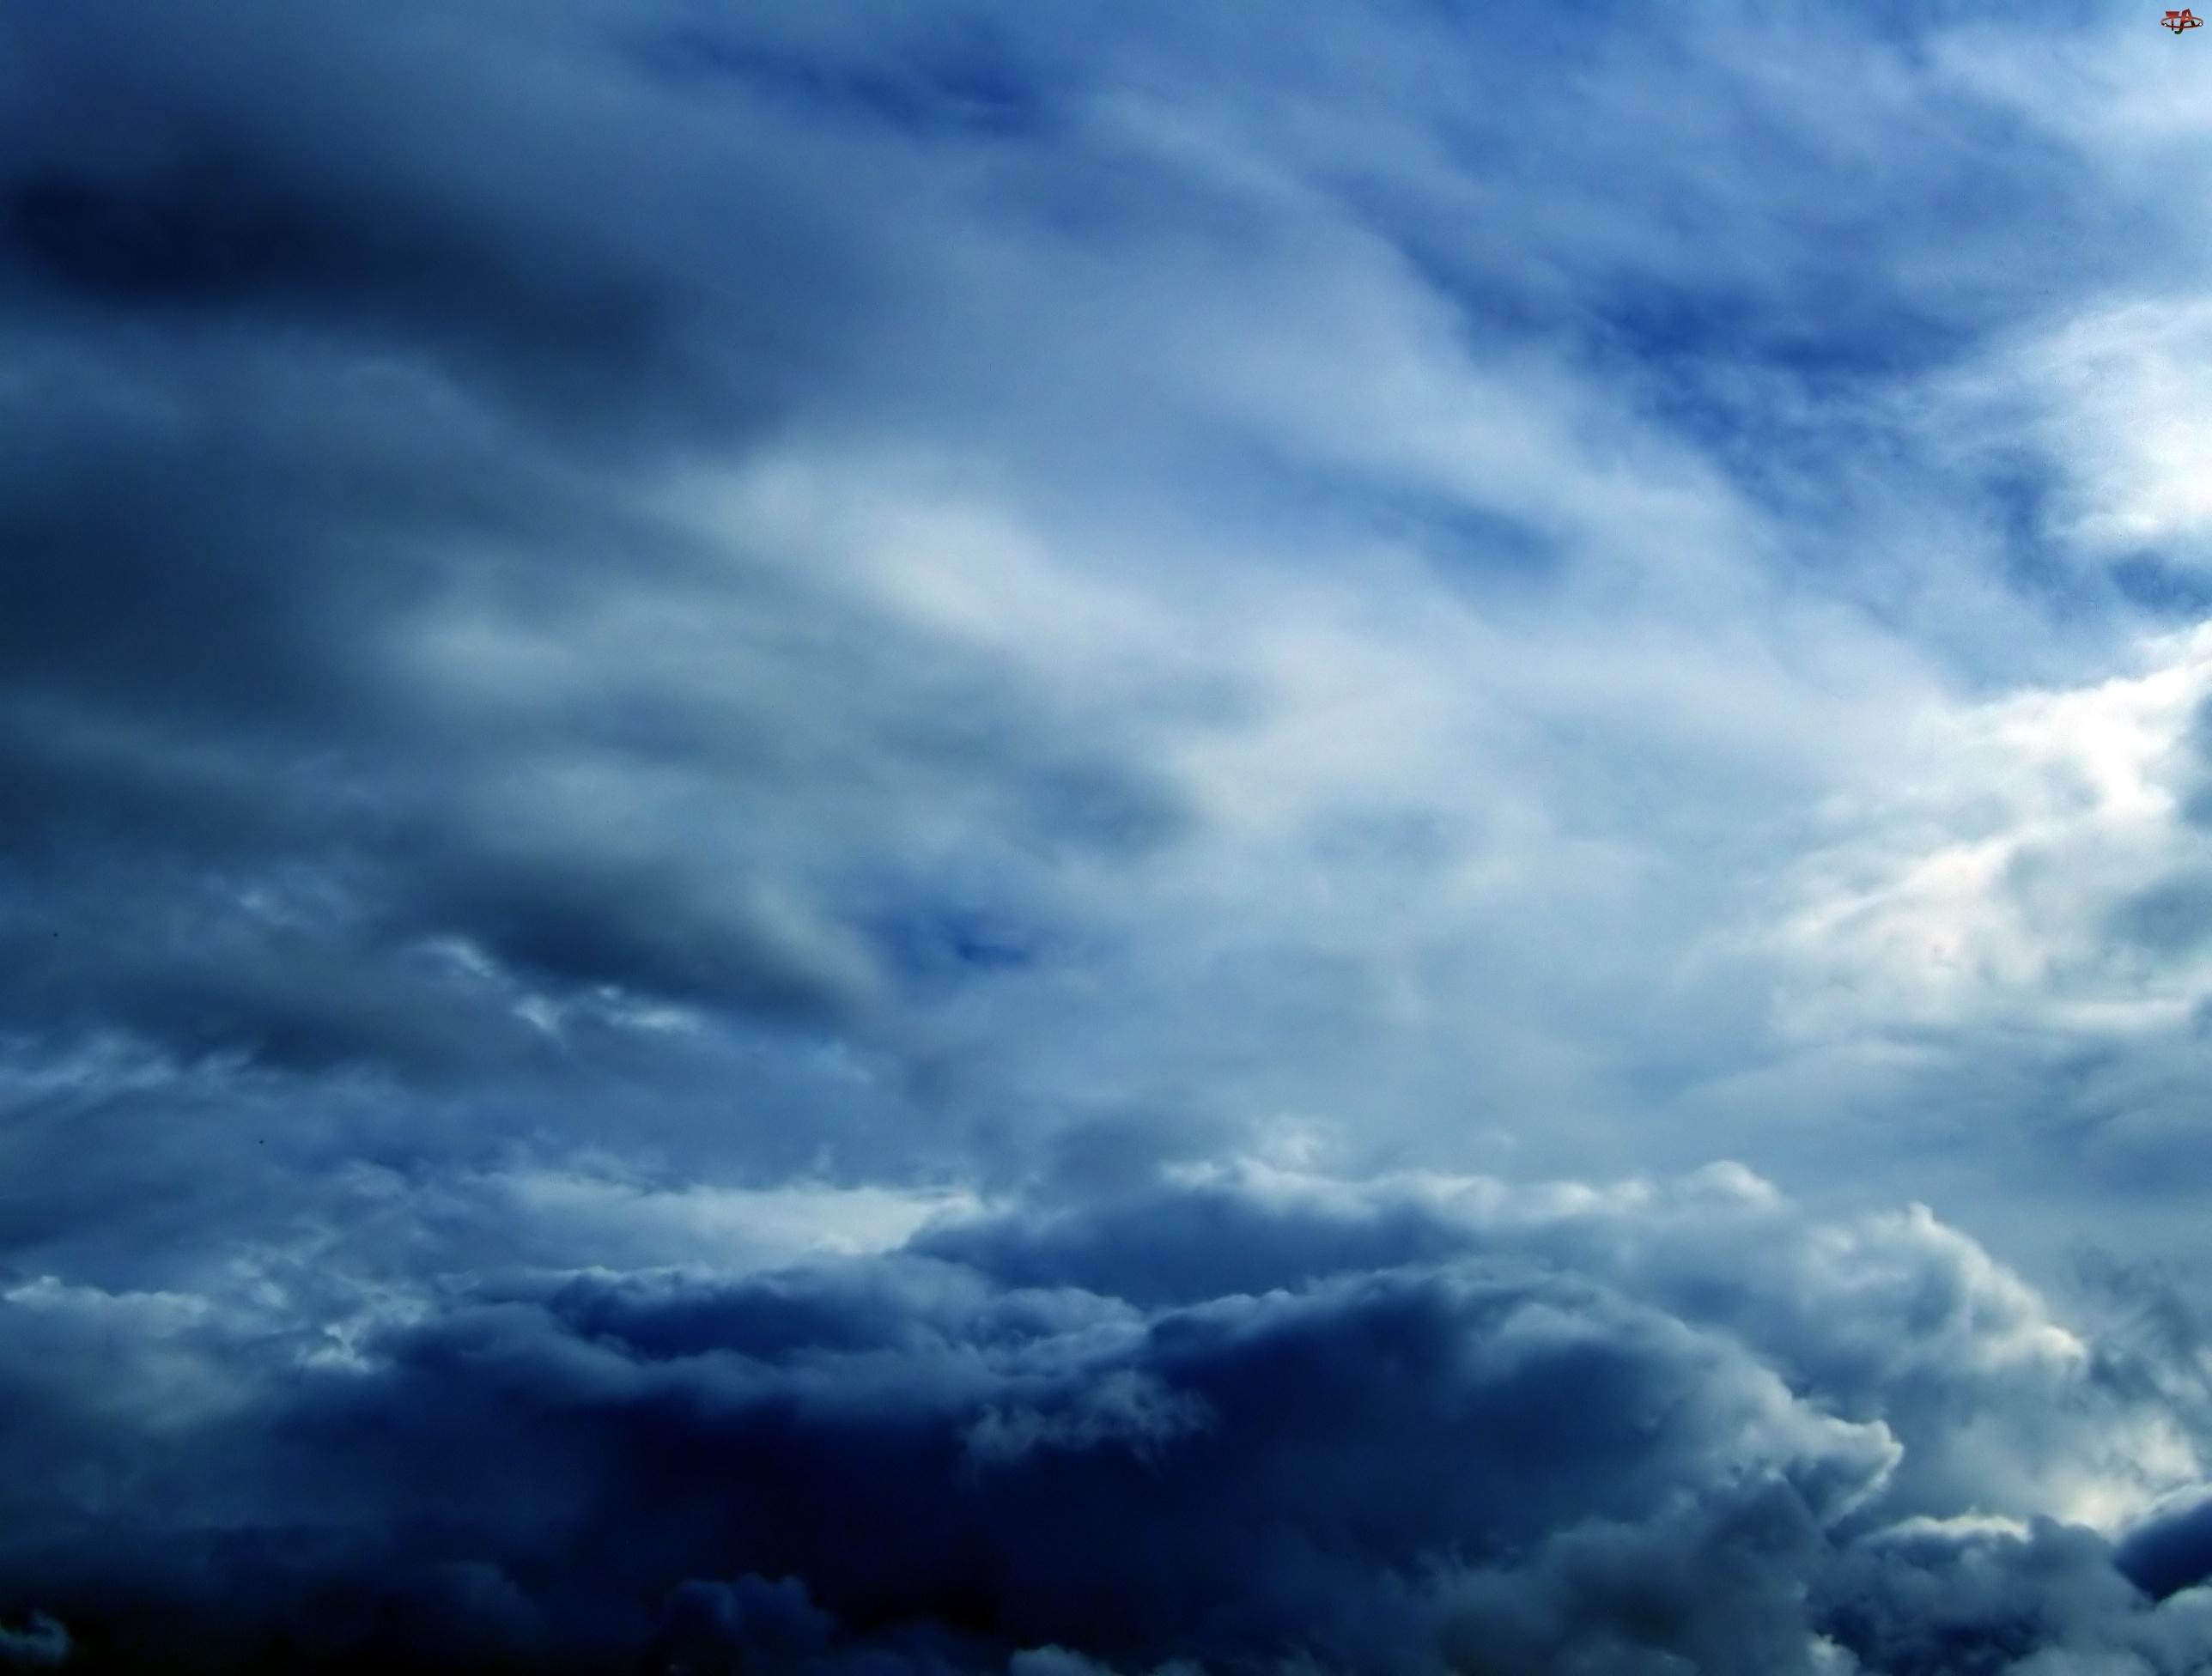 Chmury, Niebo, Burzowe